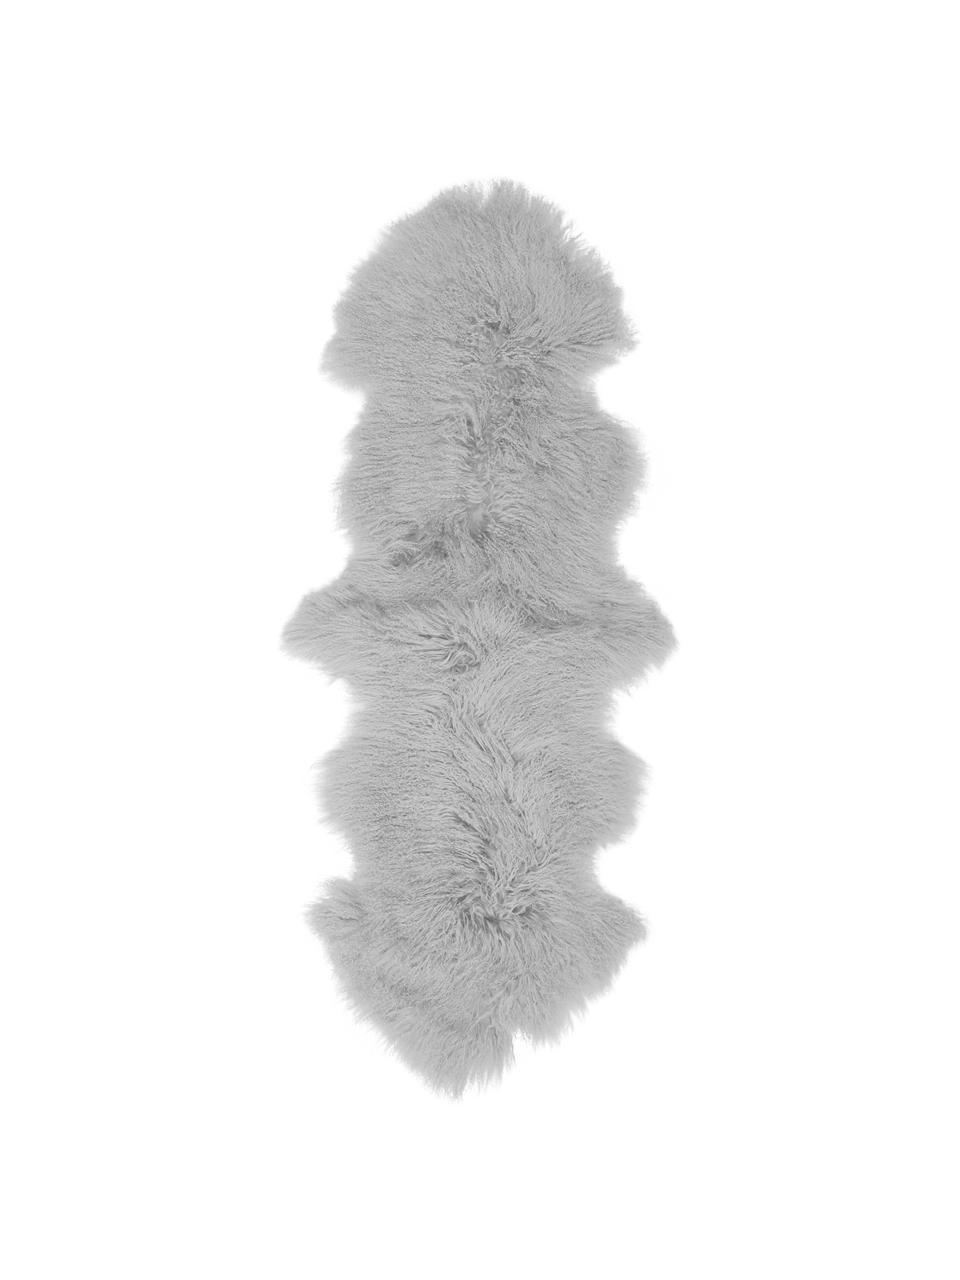 Langhaar-Lammfell-Teppich Ella, gelockt, Vorderseite: Mongolisches Lammfell, Rückseite: Leder, Hellgrau, 50 x 160 cm